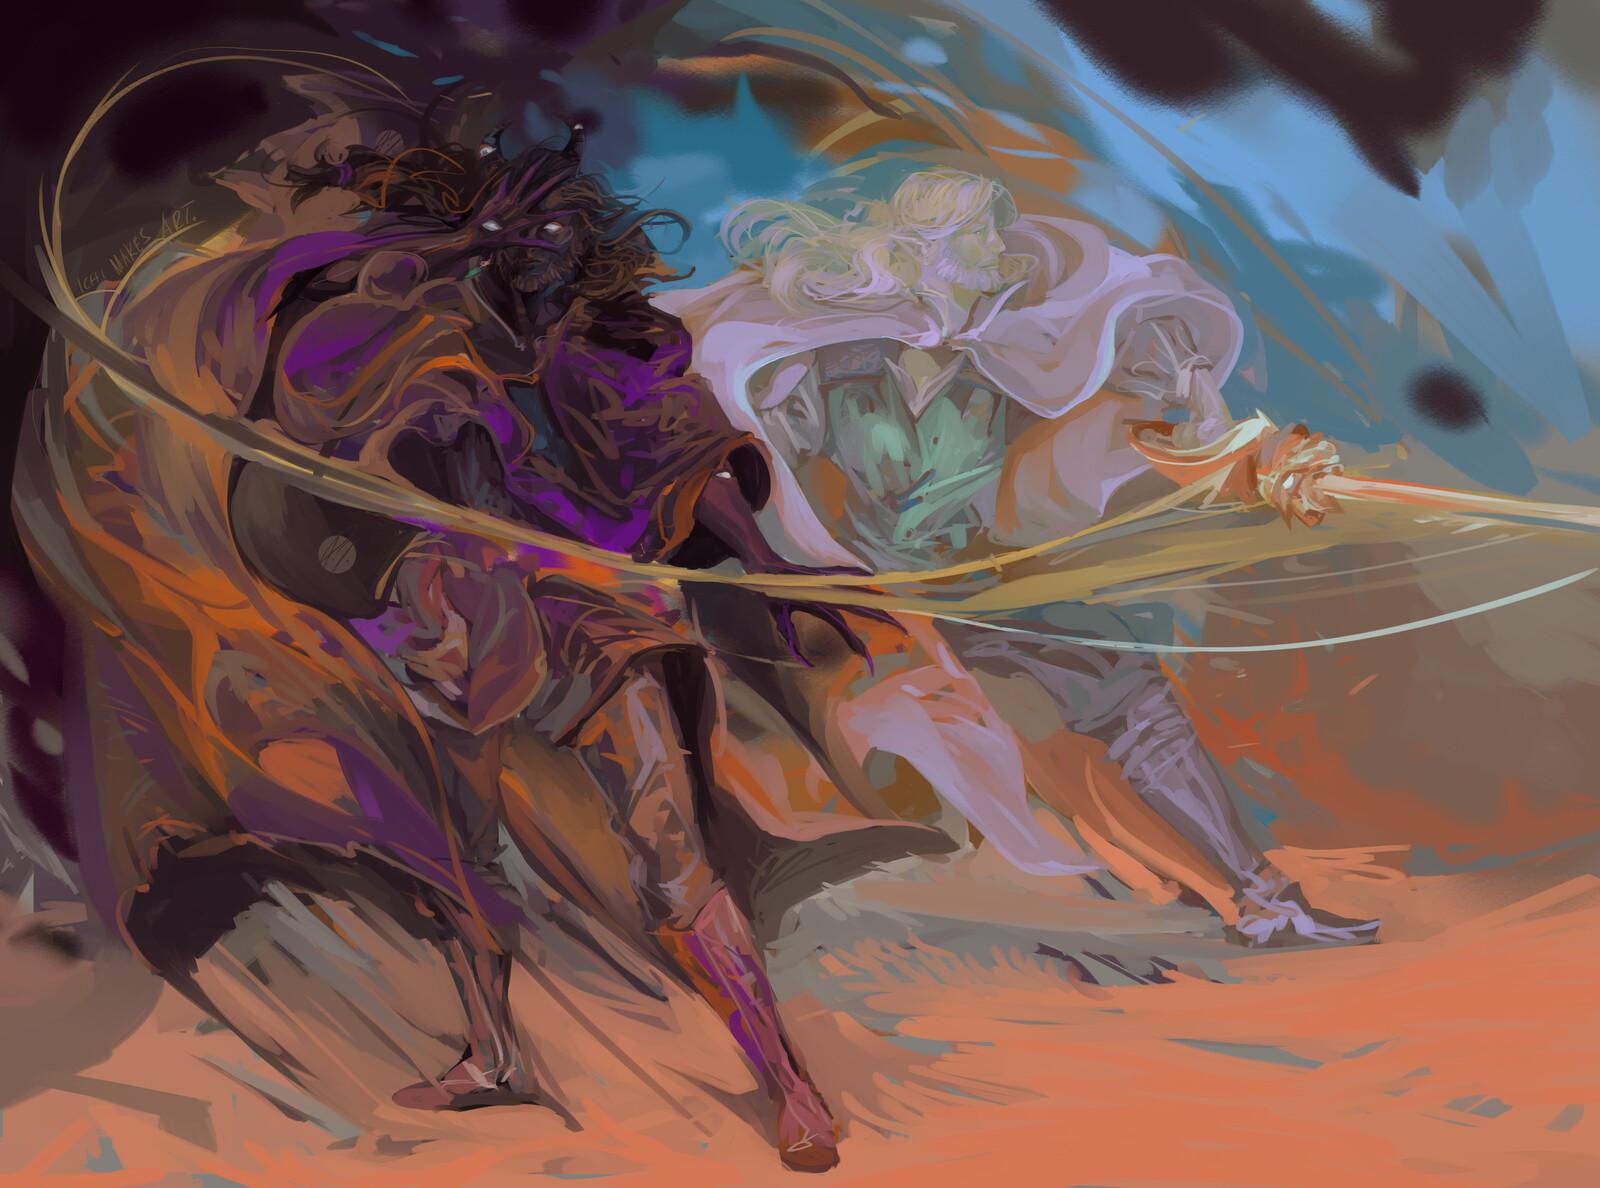 Commission for violetfoxsketches.tumblr.com